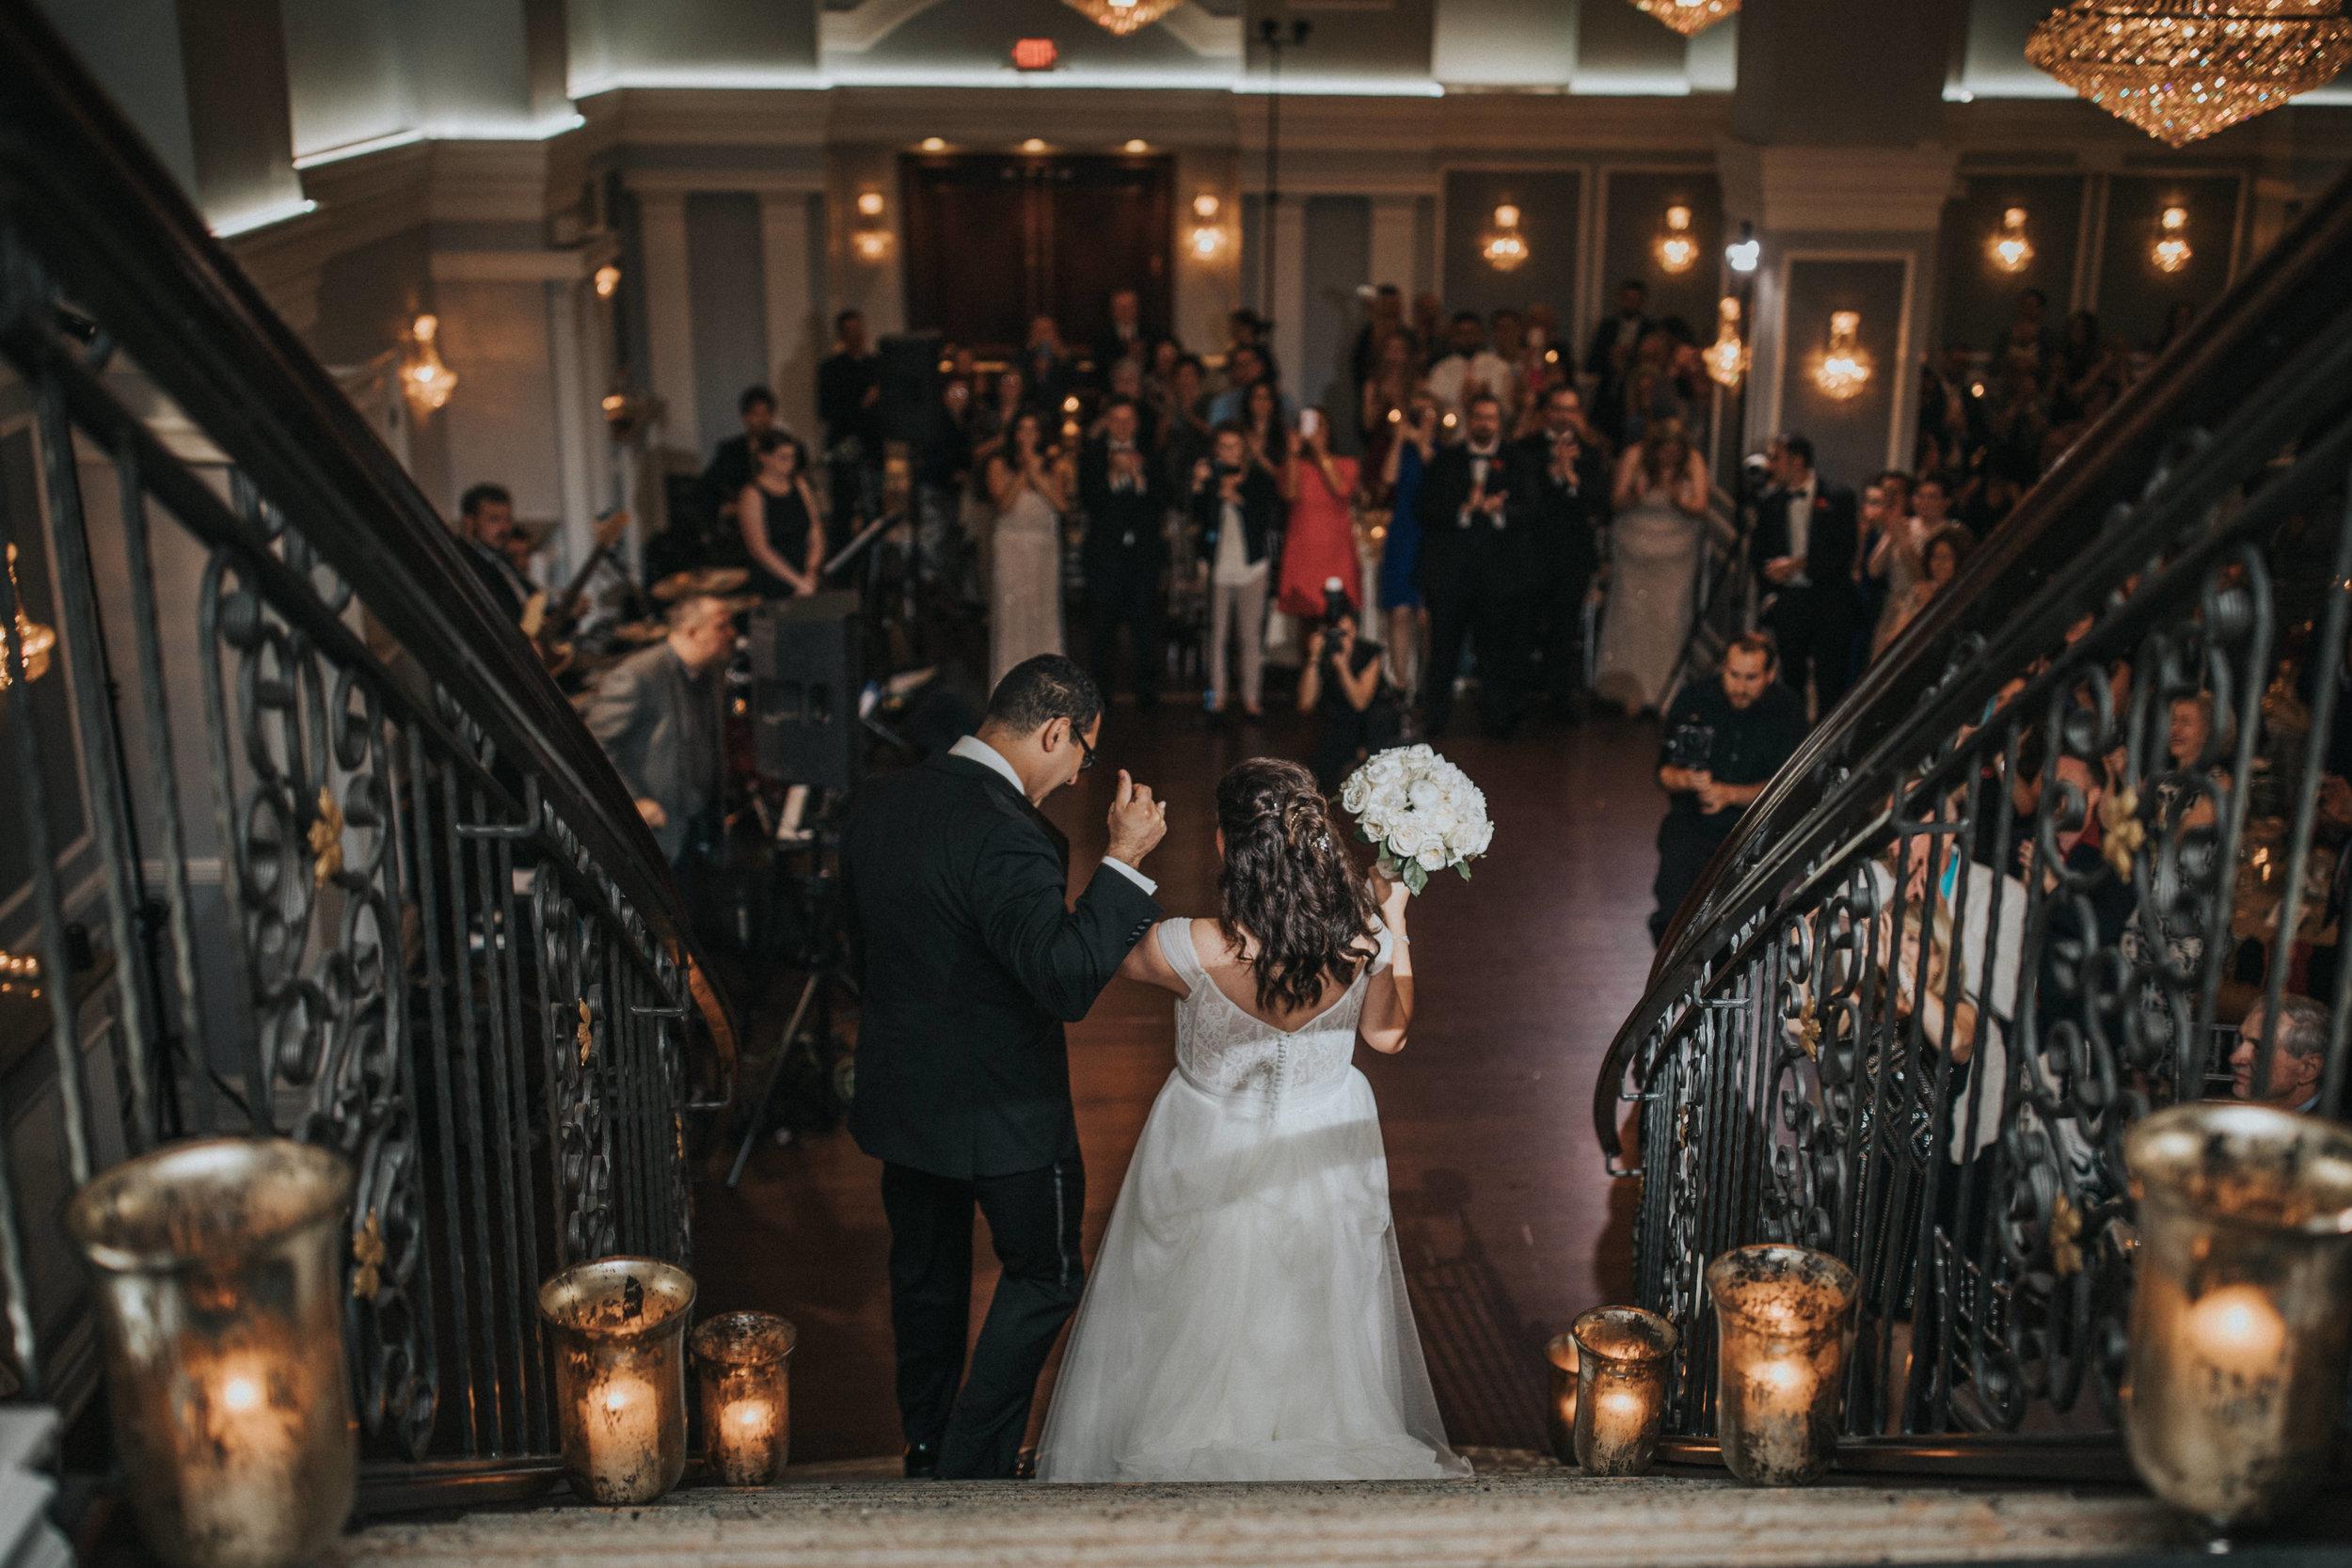 JennaLynnPhotography-NJWeddingPhotographer-Philadelphia-Wedding-ArtsBallroom-Reception-61.jpg